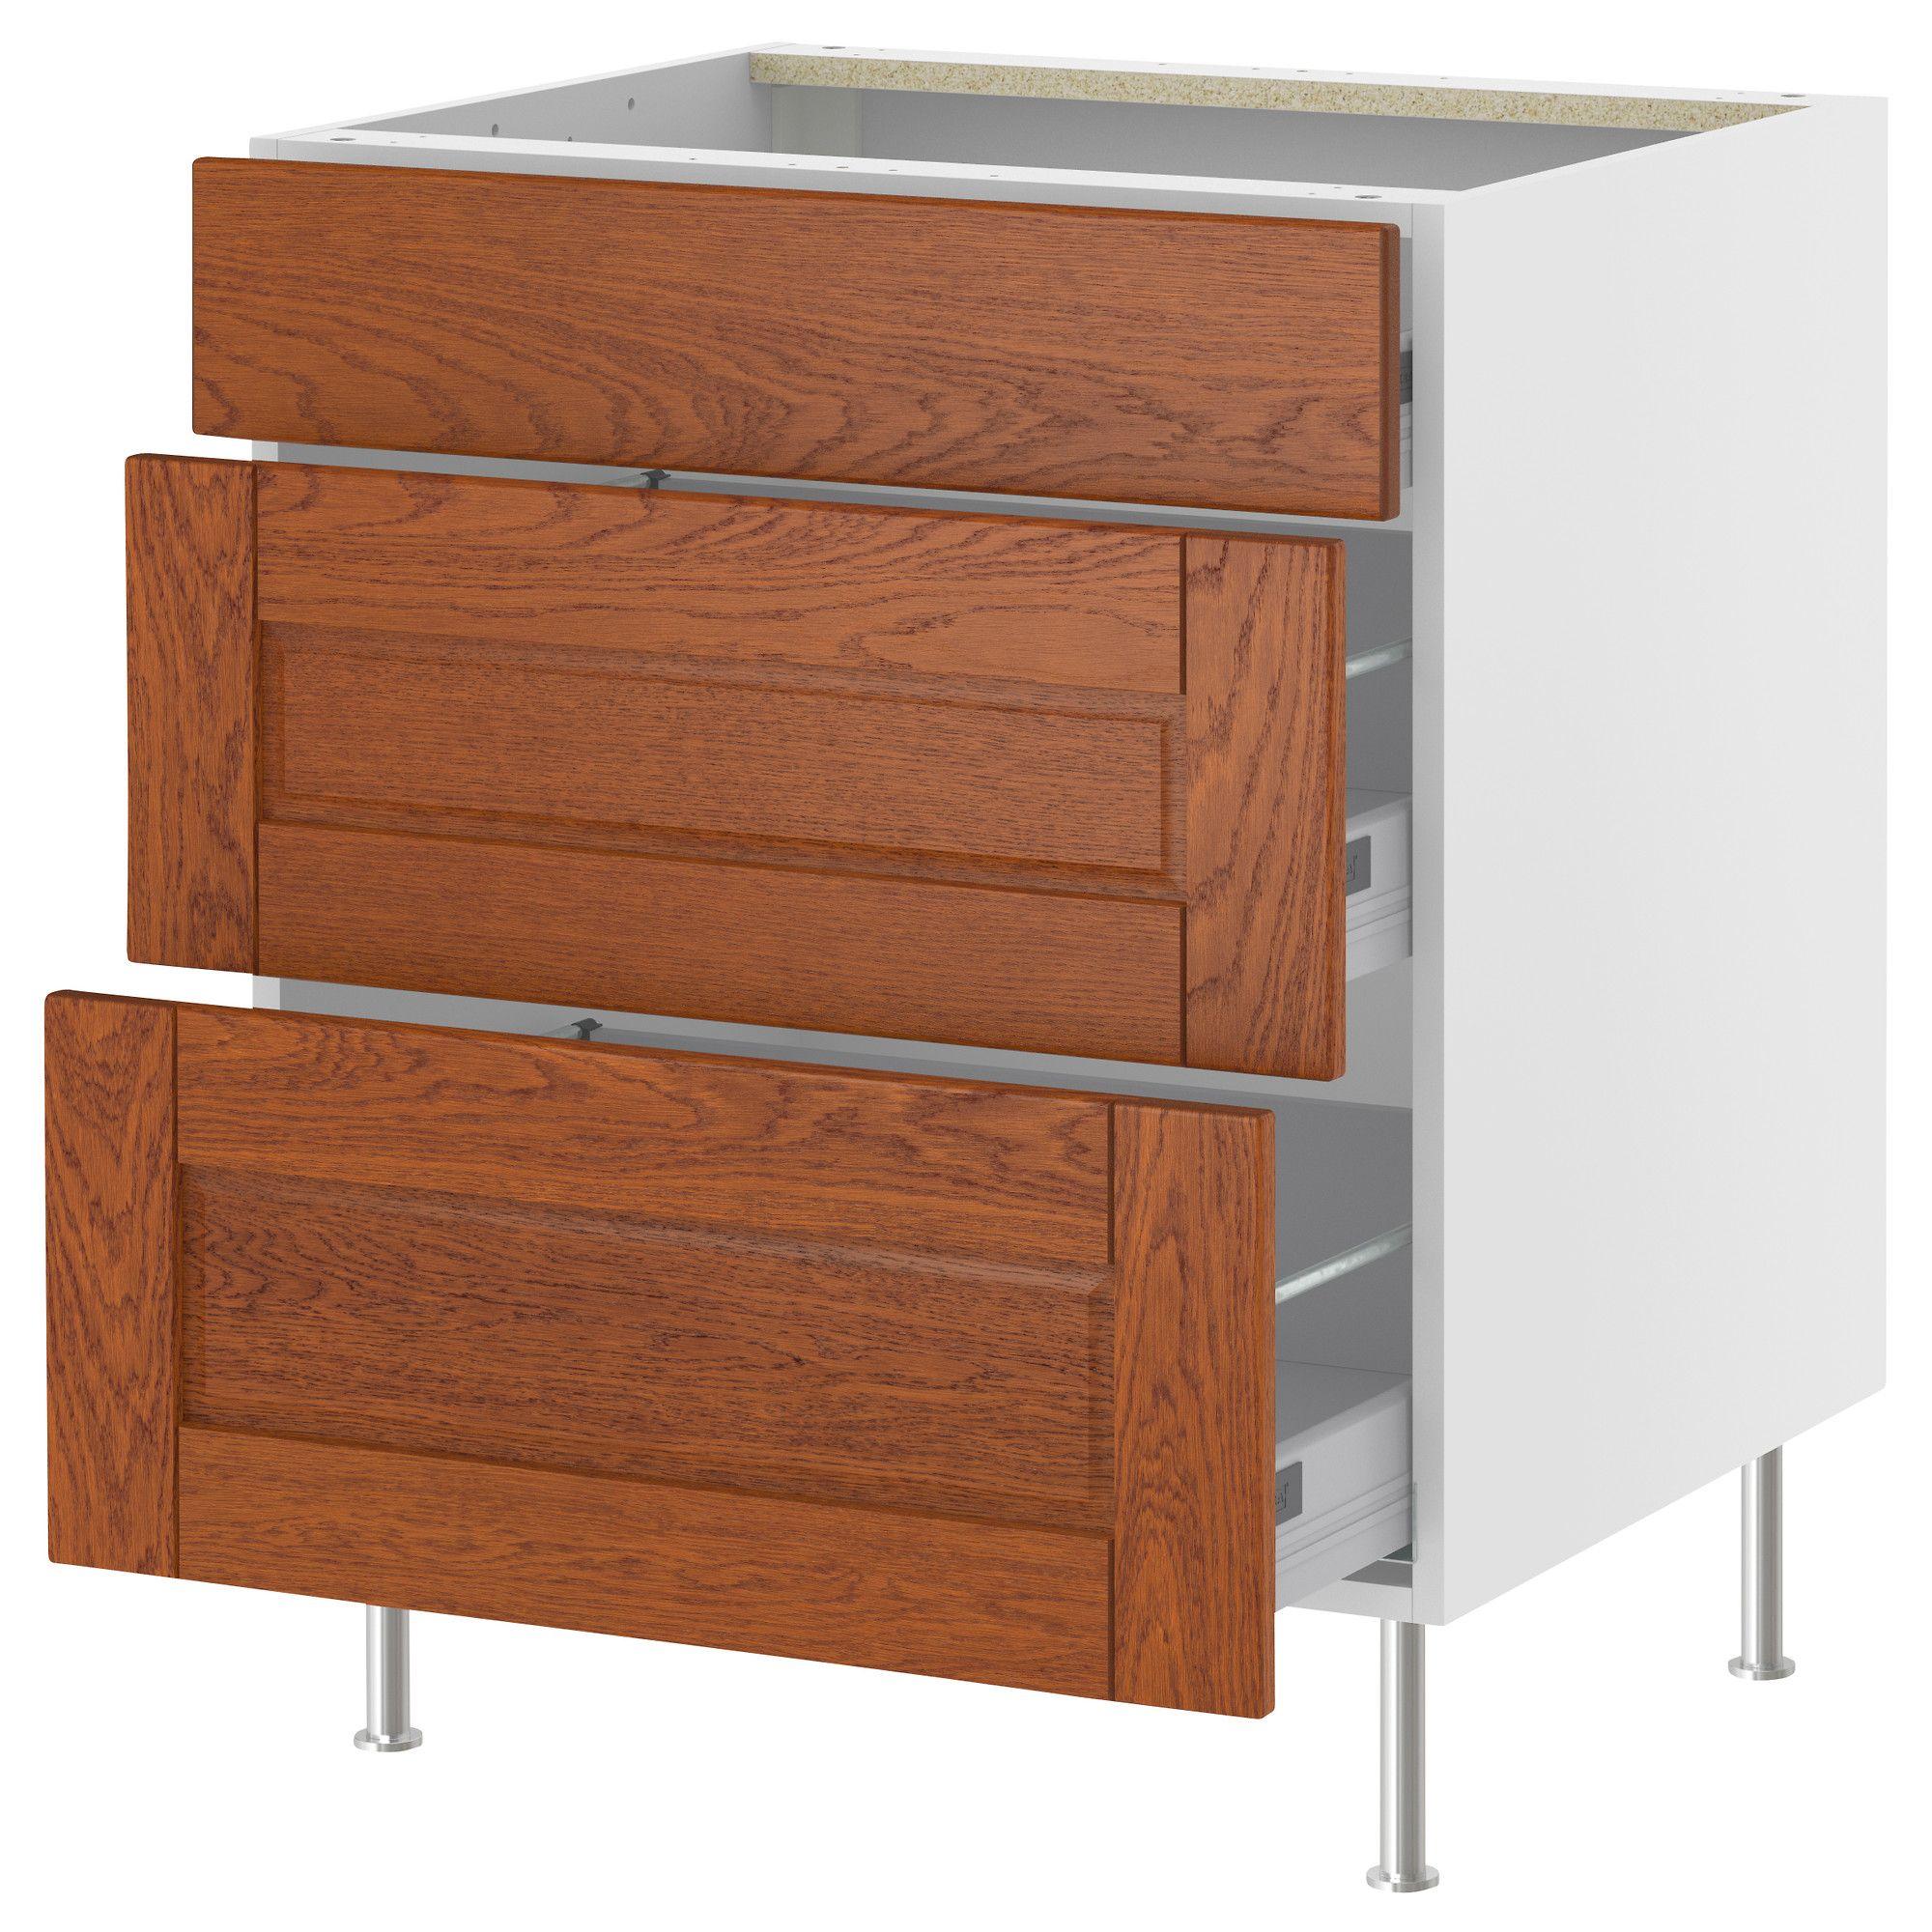 Interior Akurum Base Cabinet akurum base cabinet with 3 drawers white lixtorp brown 15 ikea